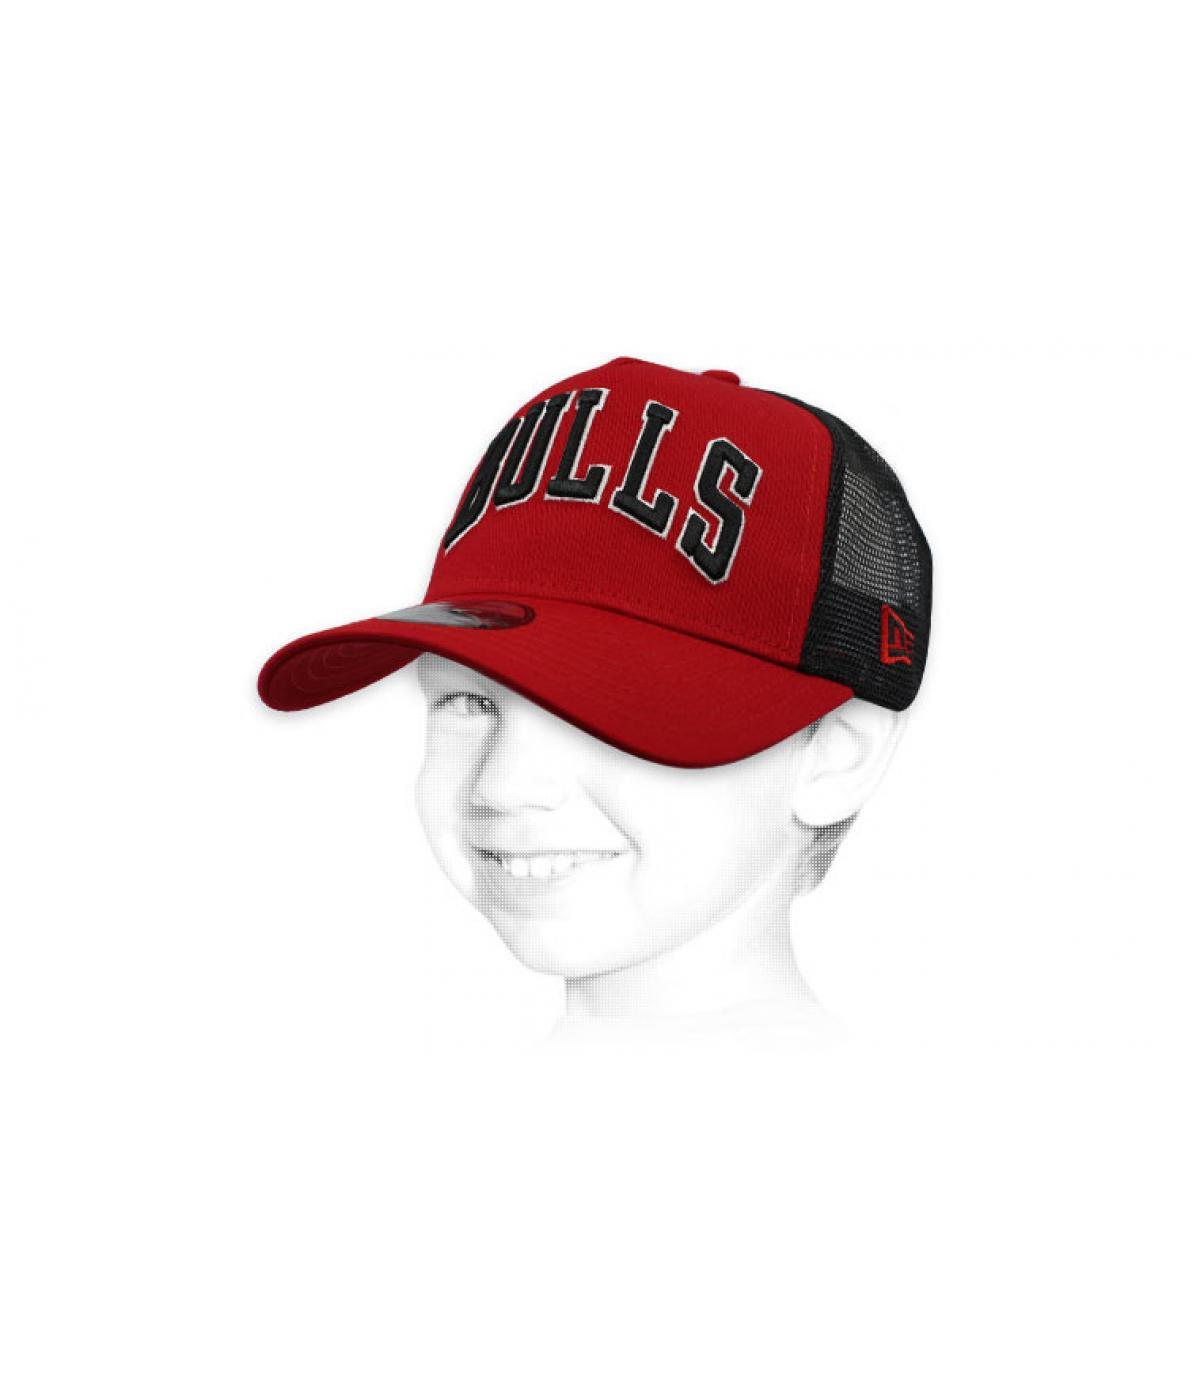 Bulls red kids trucker cap